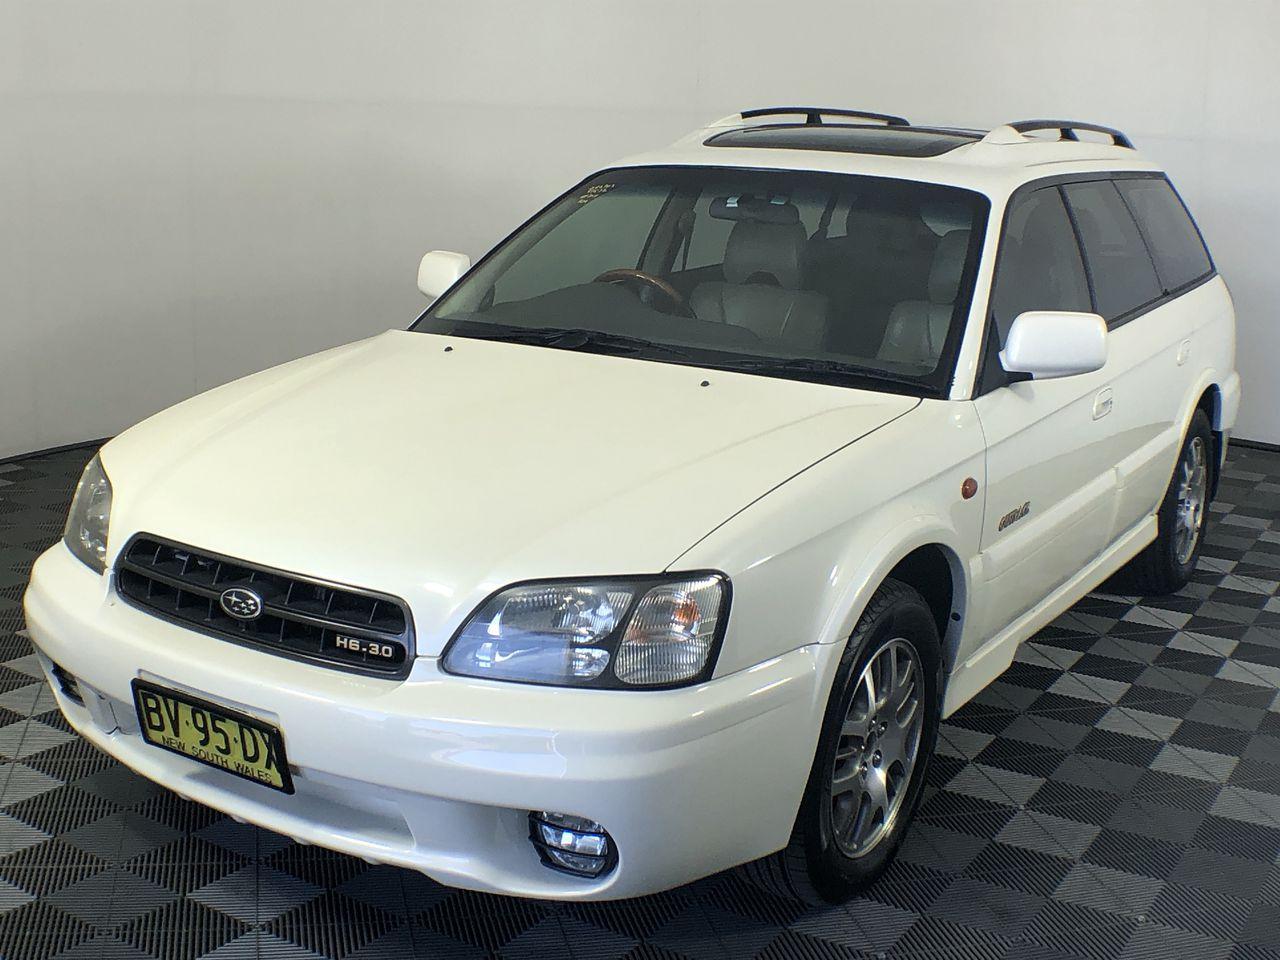 2000 Subaru Outback H6 B3A Automatic Wagon